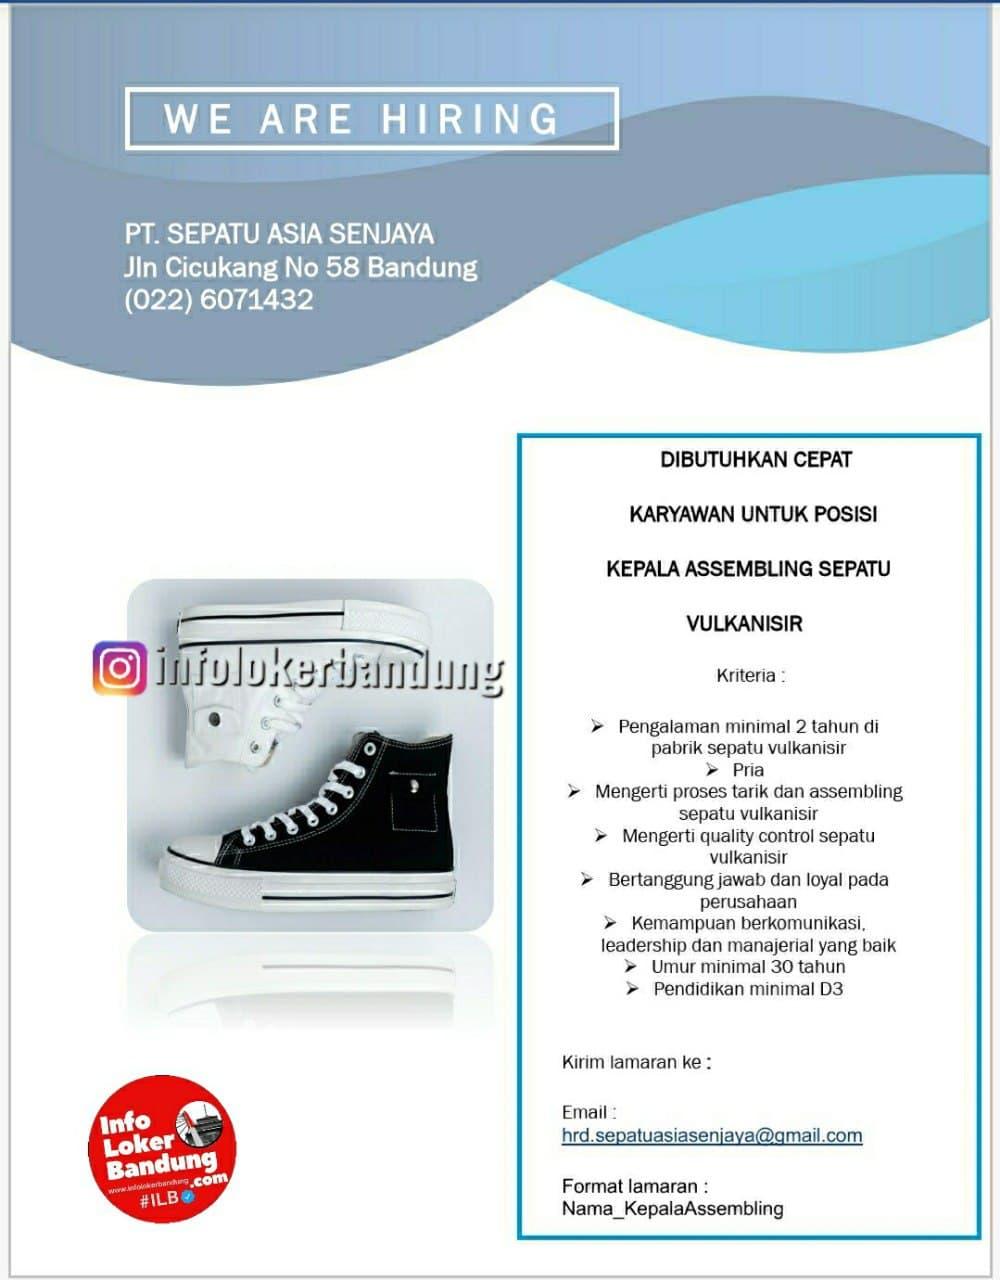 Lowongan Kerja PT. Sepatu Asia Senjaya Bandung Desember 2020